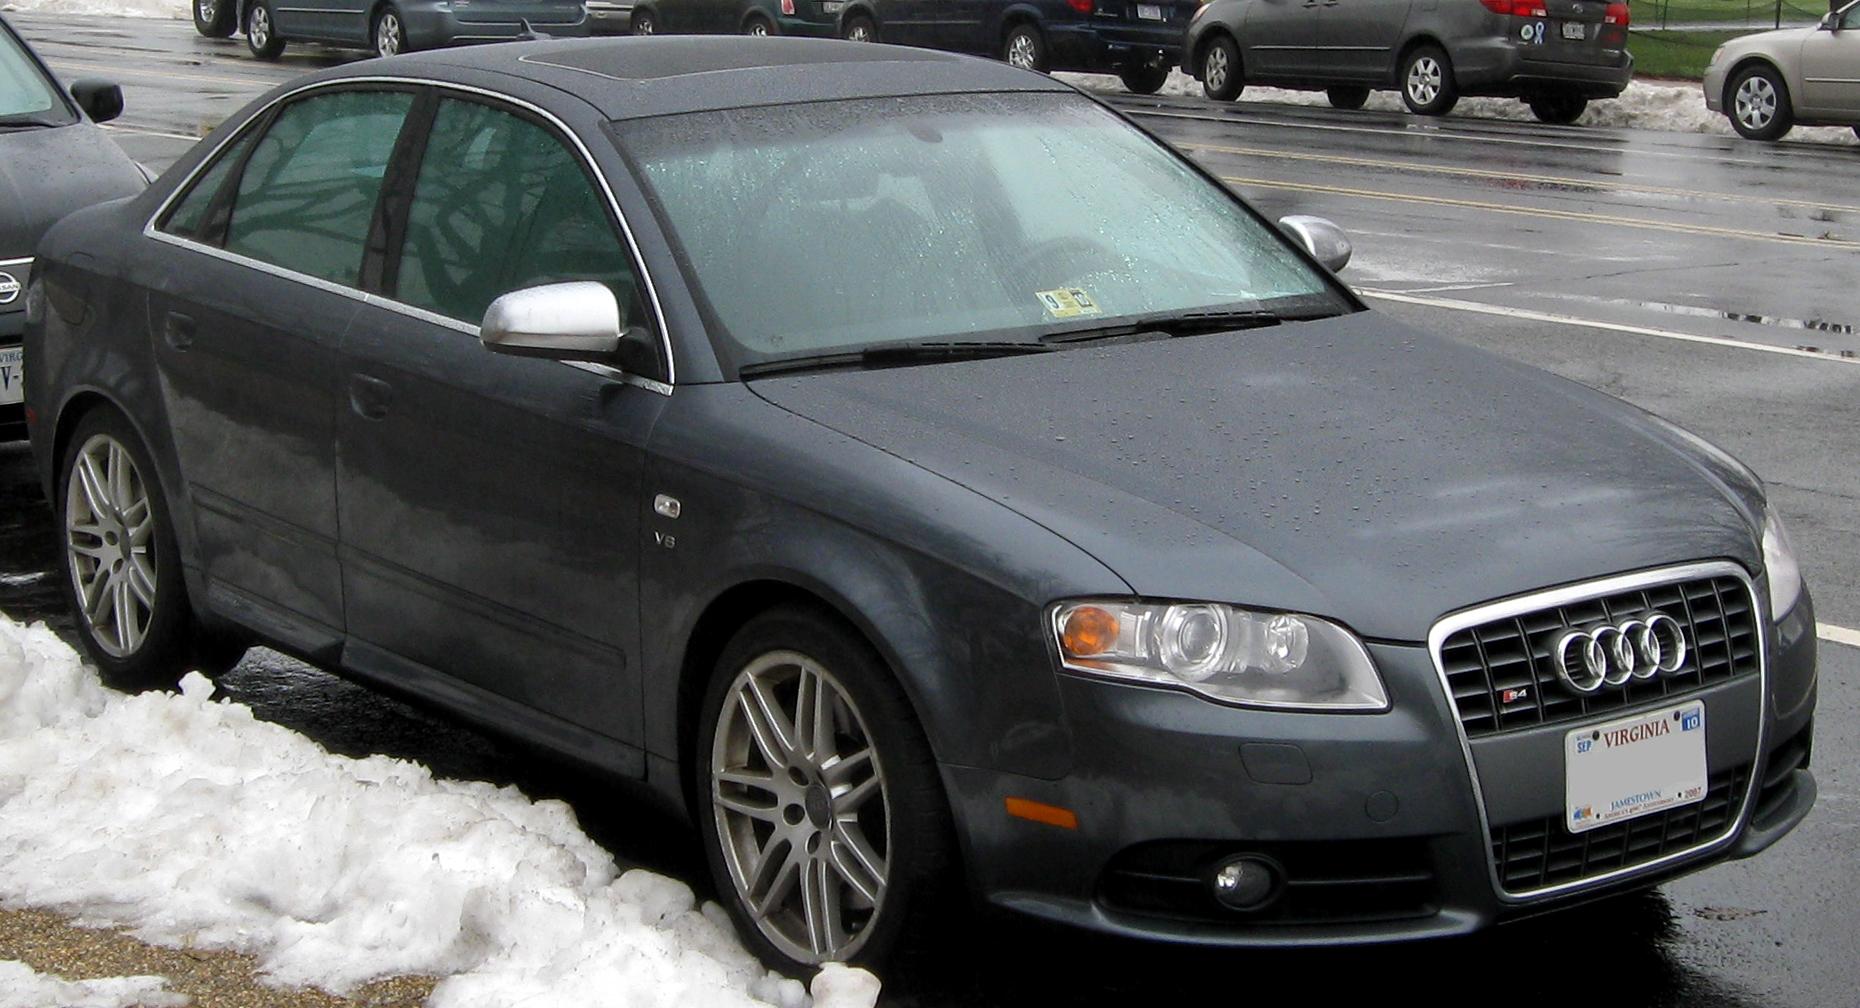 File Audi S4 Sedan B7 12 26 2009 Jpg